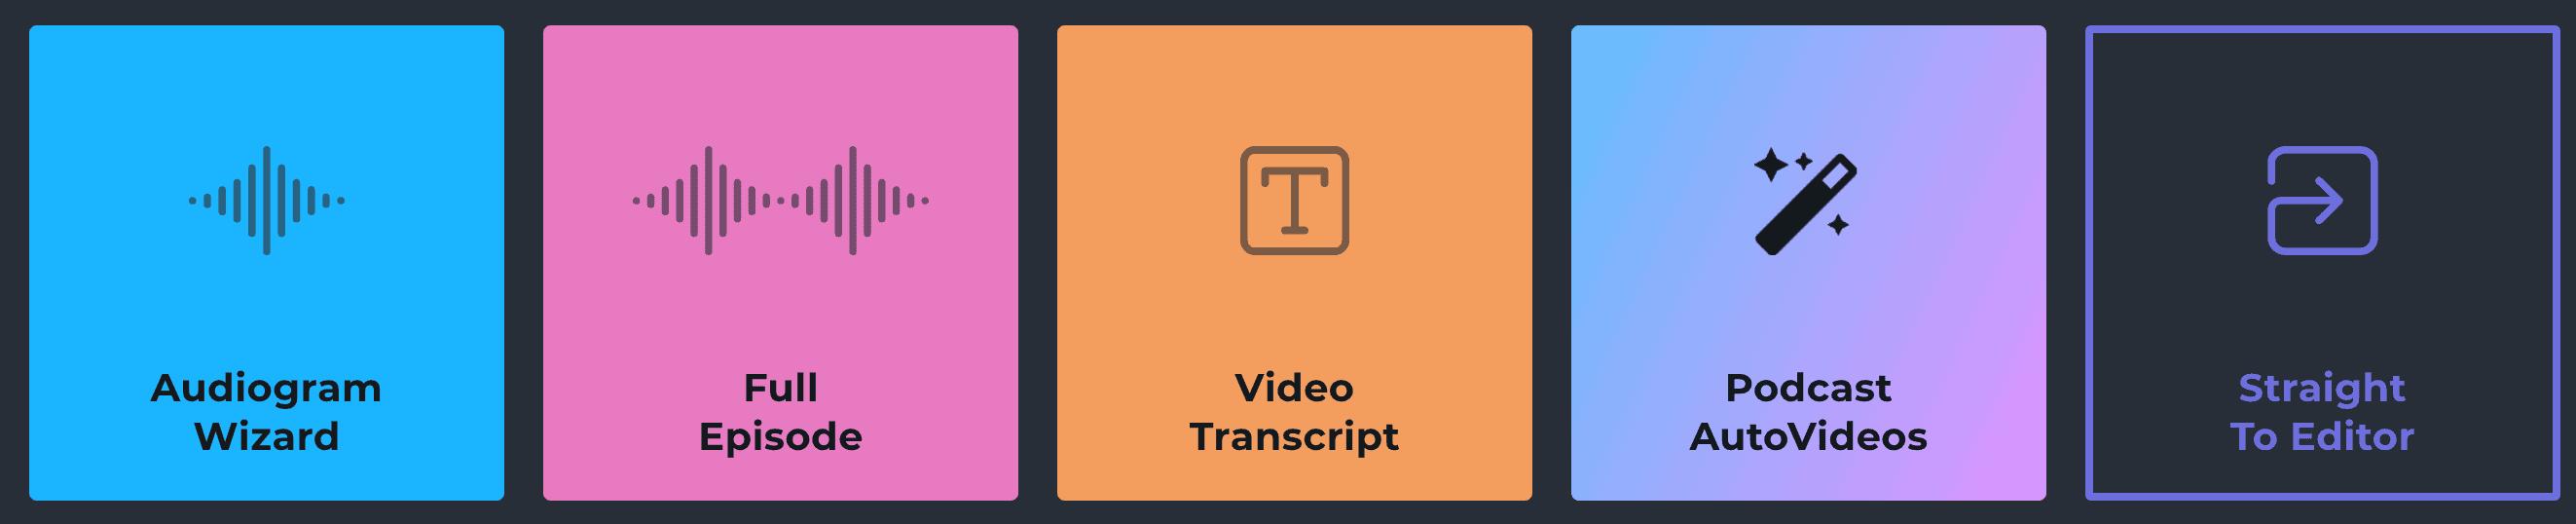 Headliner Video Series - EP1 How to Create Audiogram Video with Headliner Audiogram Wizard 3